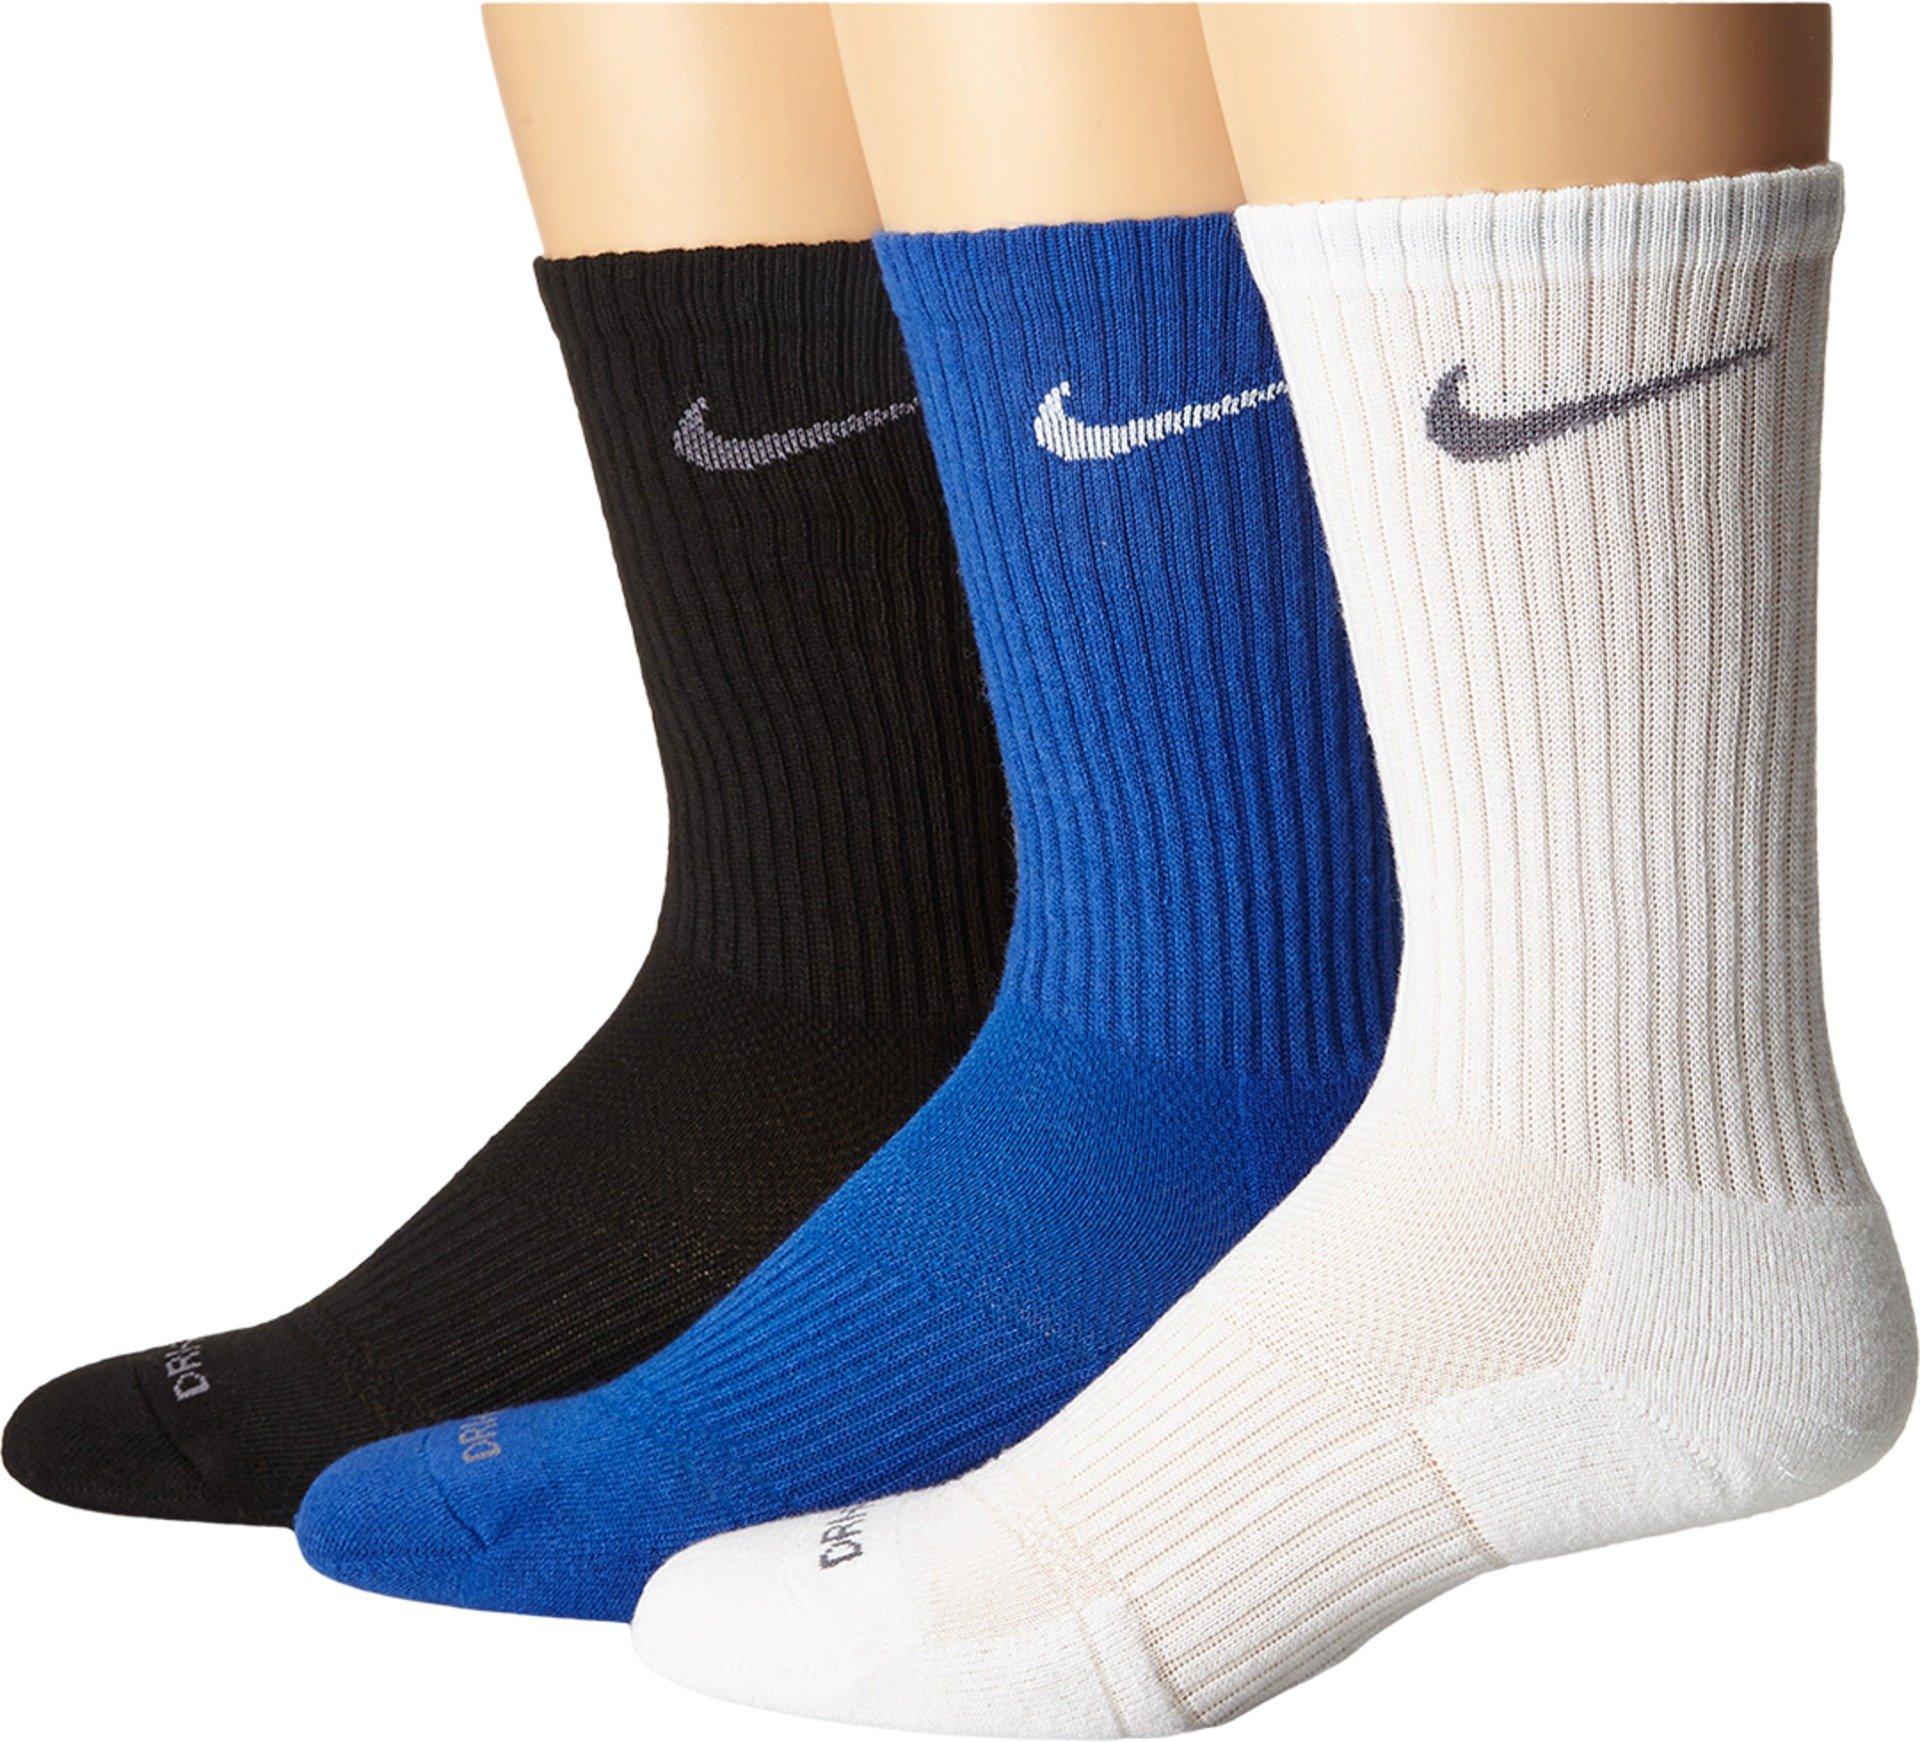 Nike Men's Dri-FIT Cushioned Crew Socks, Large 8-12 (Pack of 3), Large, Blue/White/Black